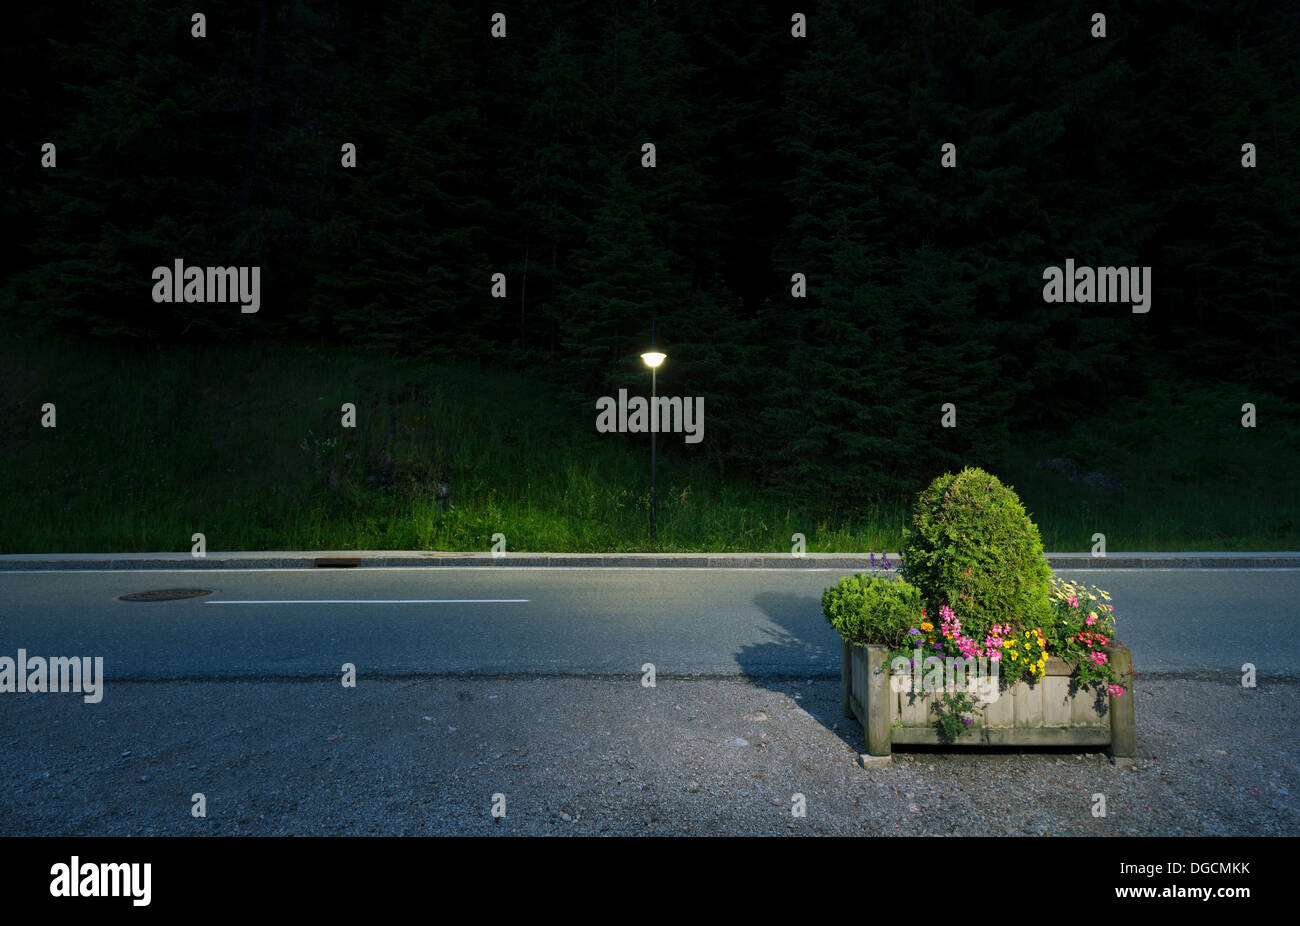 Box of flowers by roadside, Salzburg, Austria - Stock Image